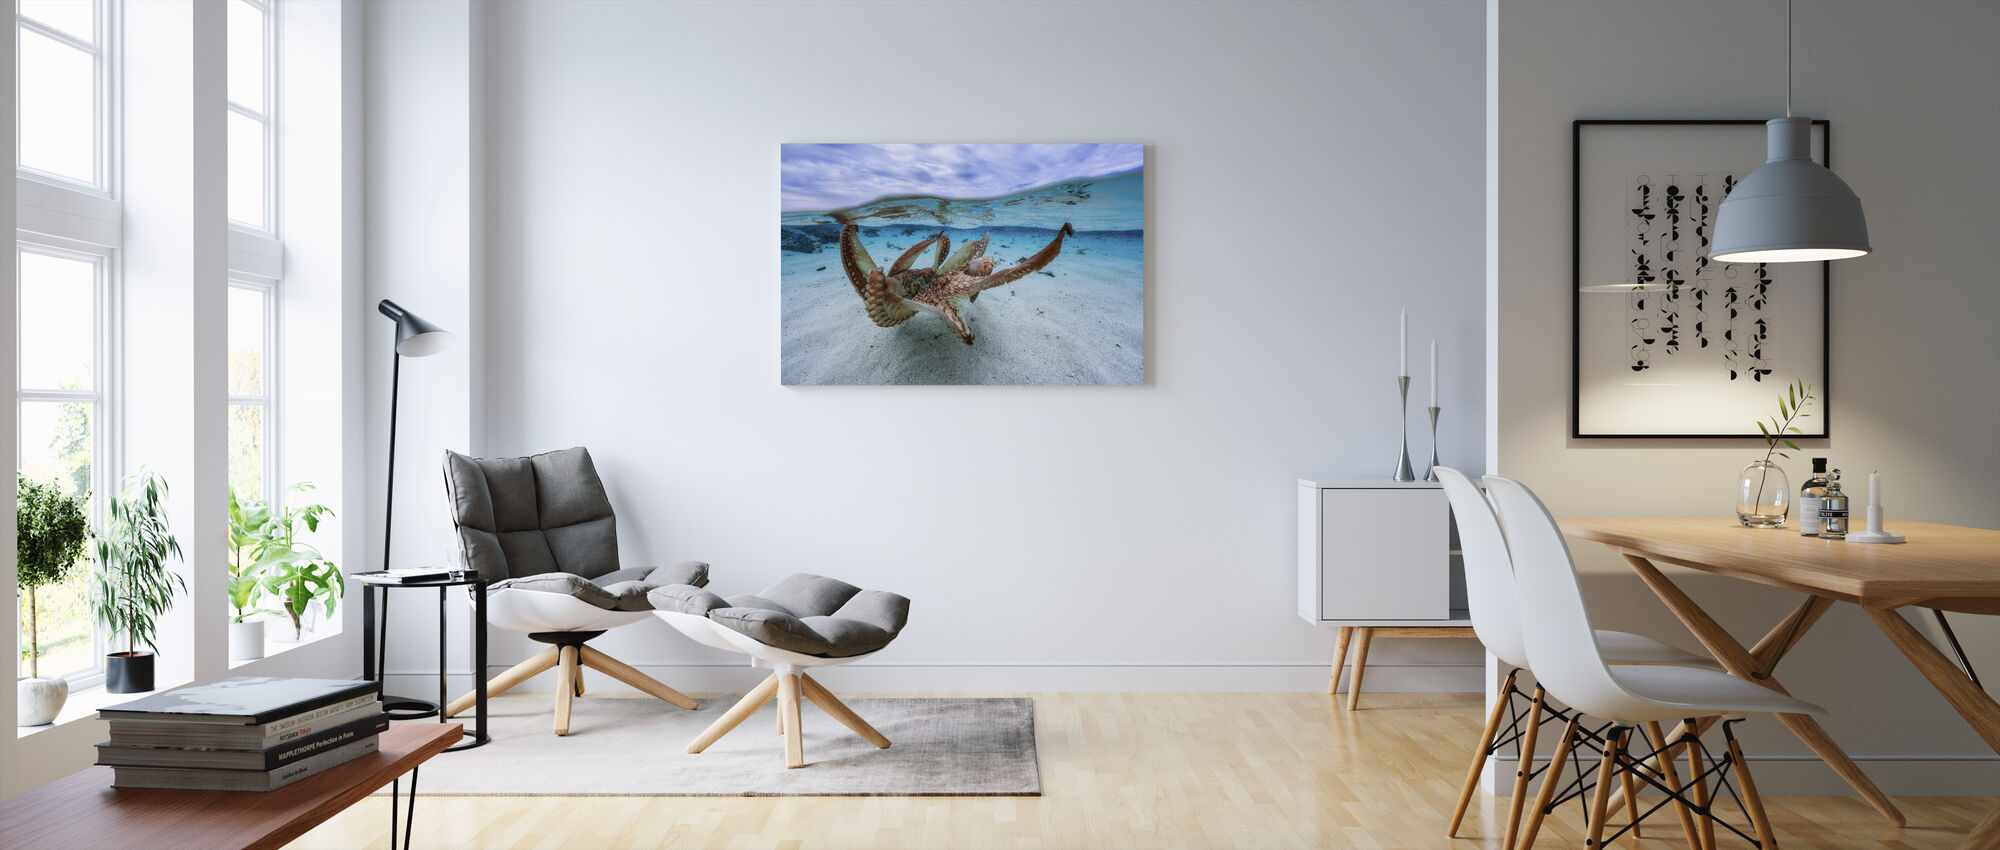 Mustekala - Canvastaulu - Olohuone